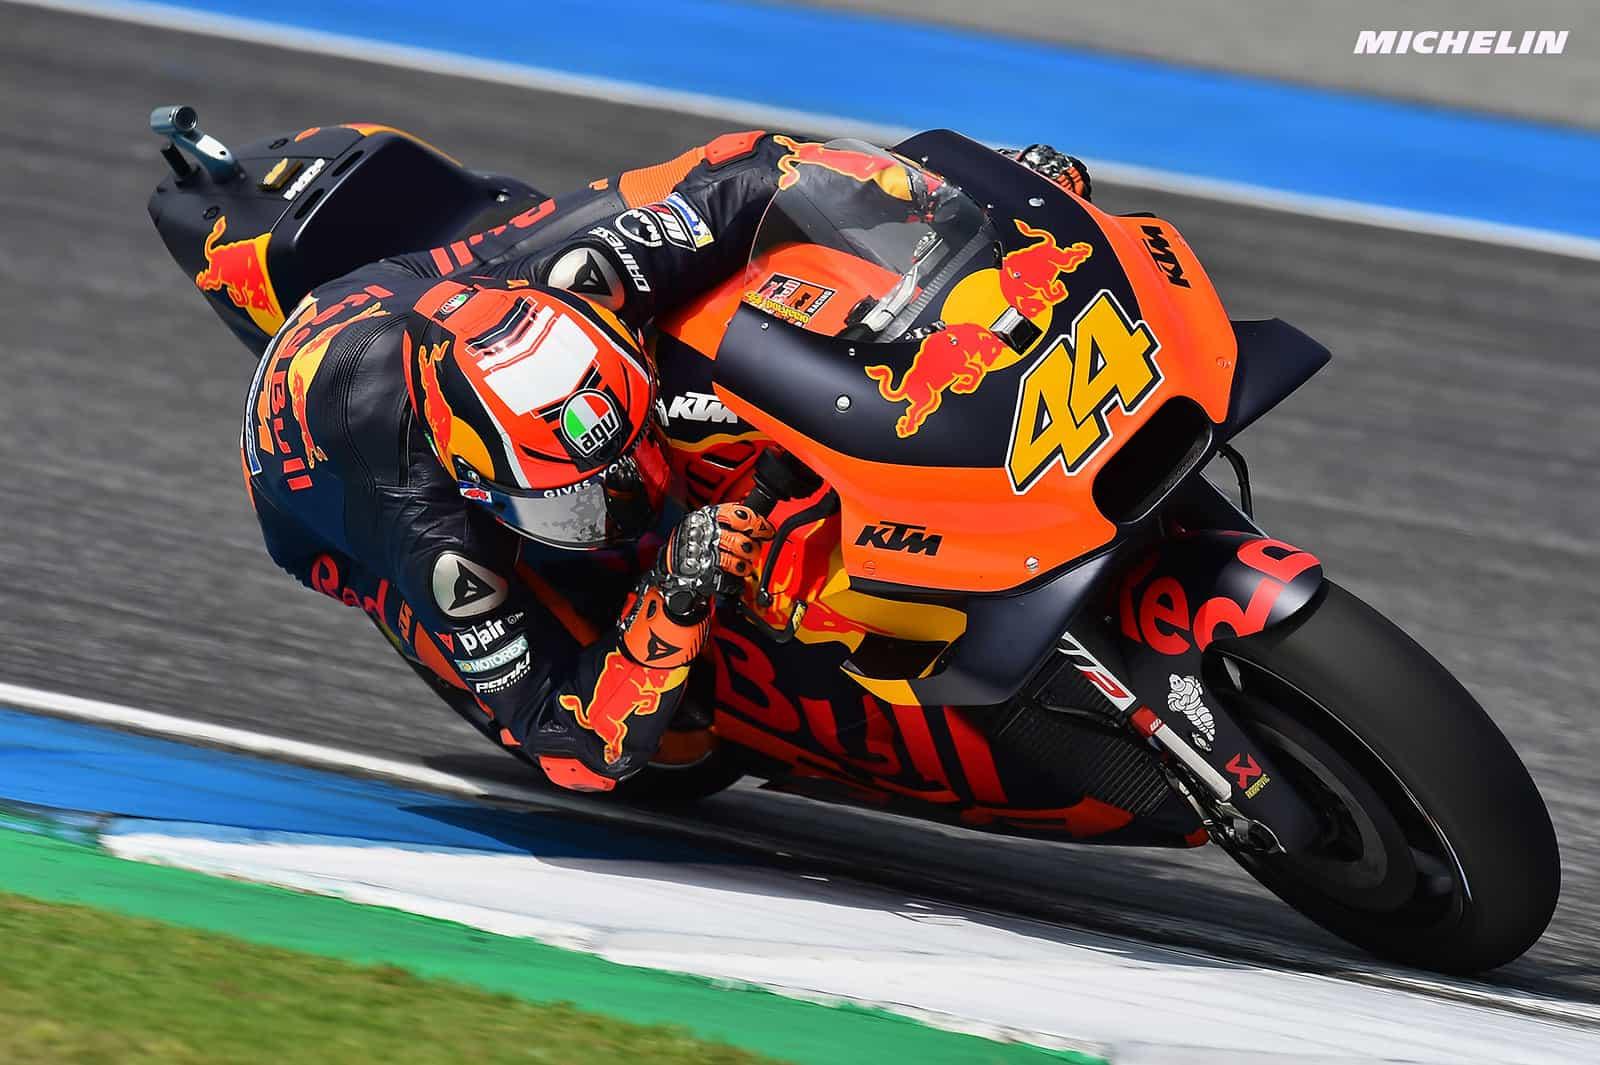 MotoGP2019タイGP 13位ポル・エスパルガロ「怪我、状況を考えると十分な結果」